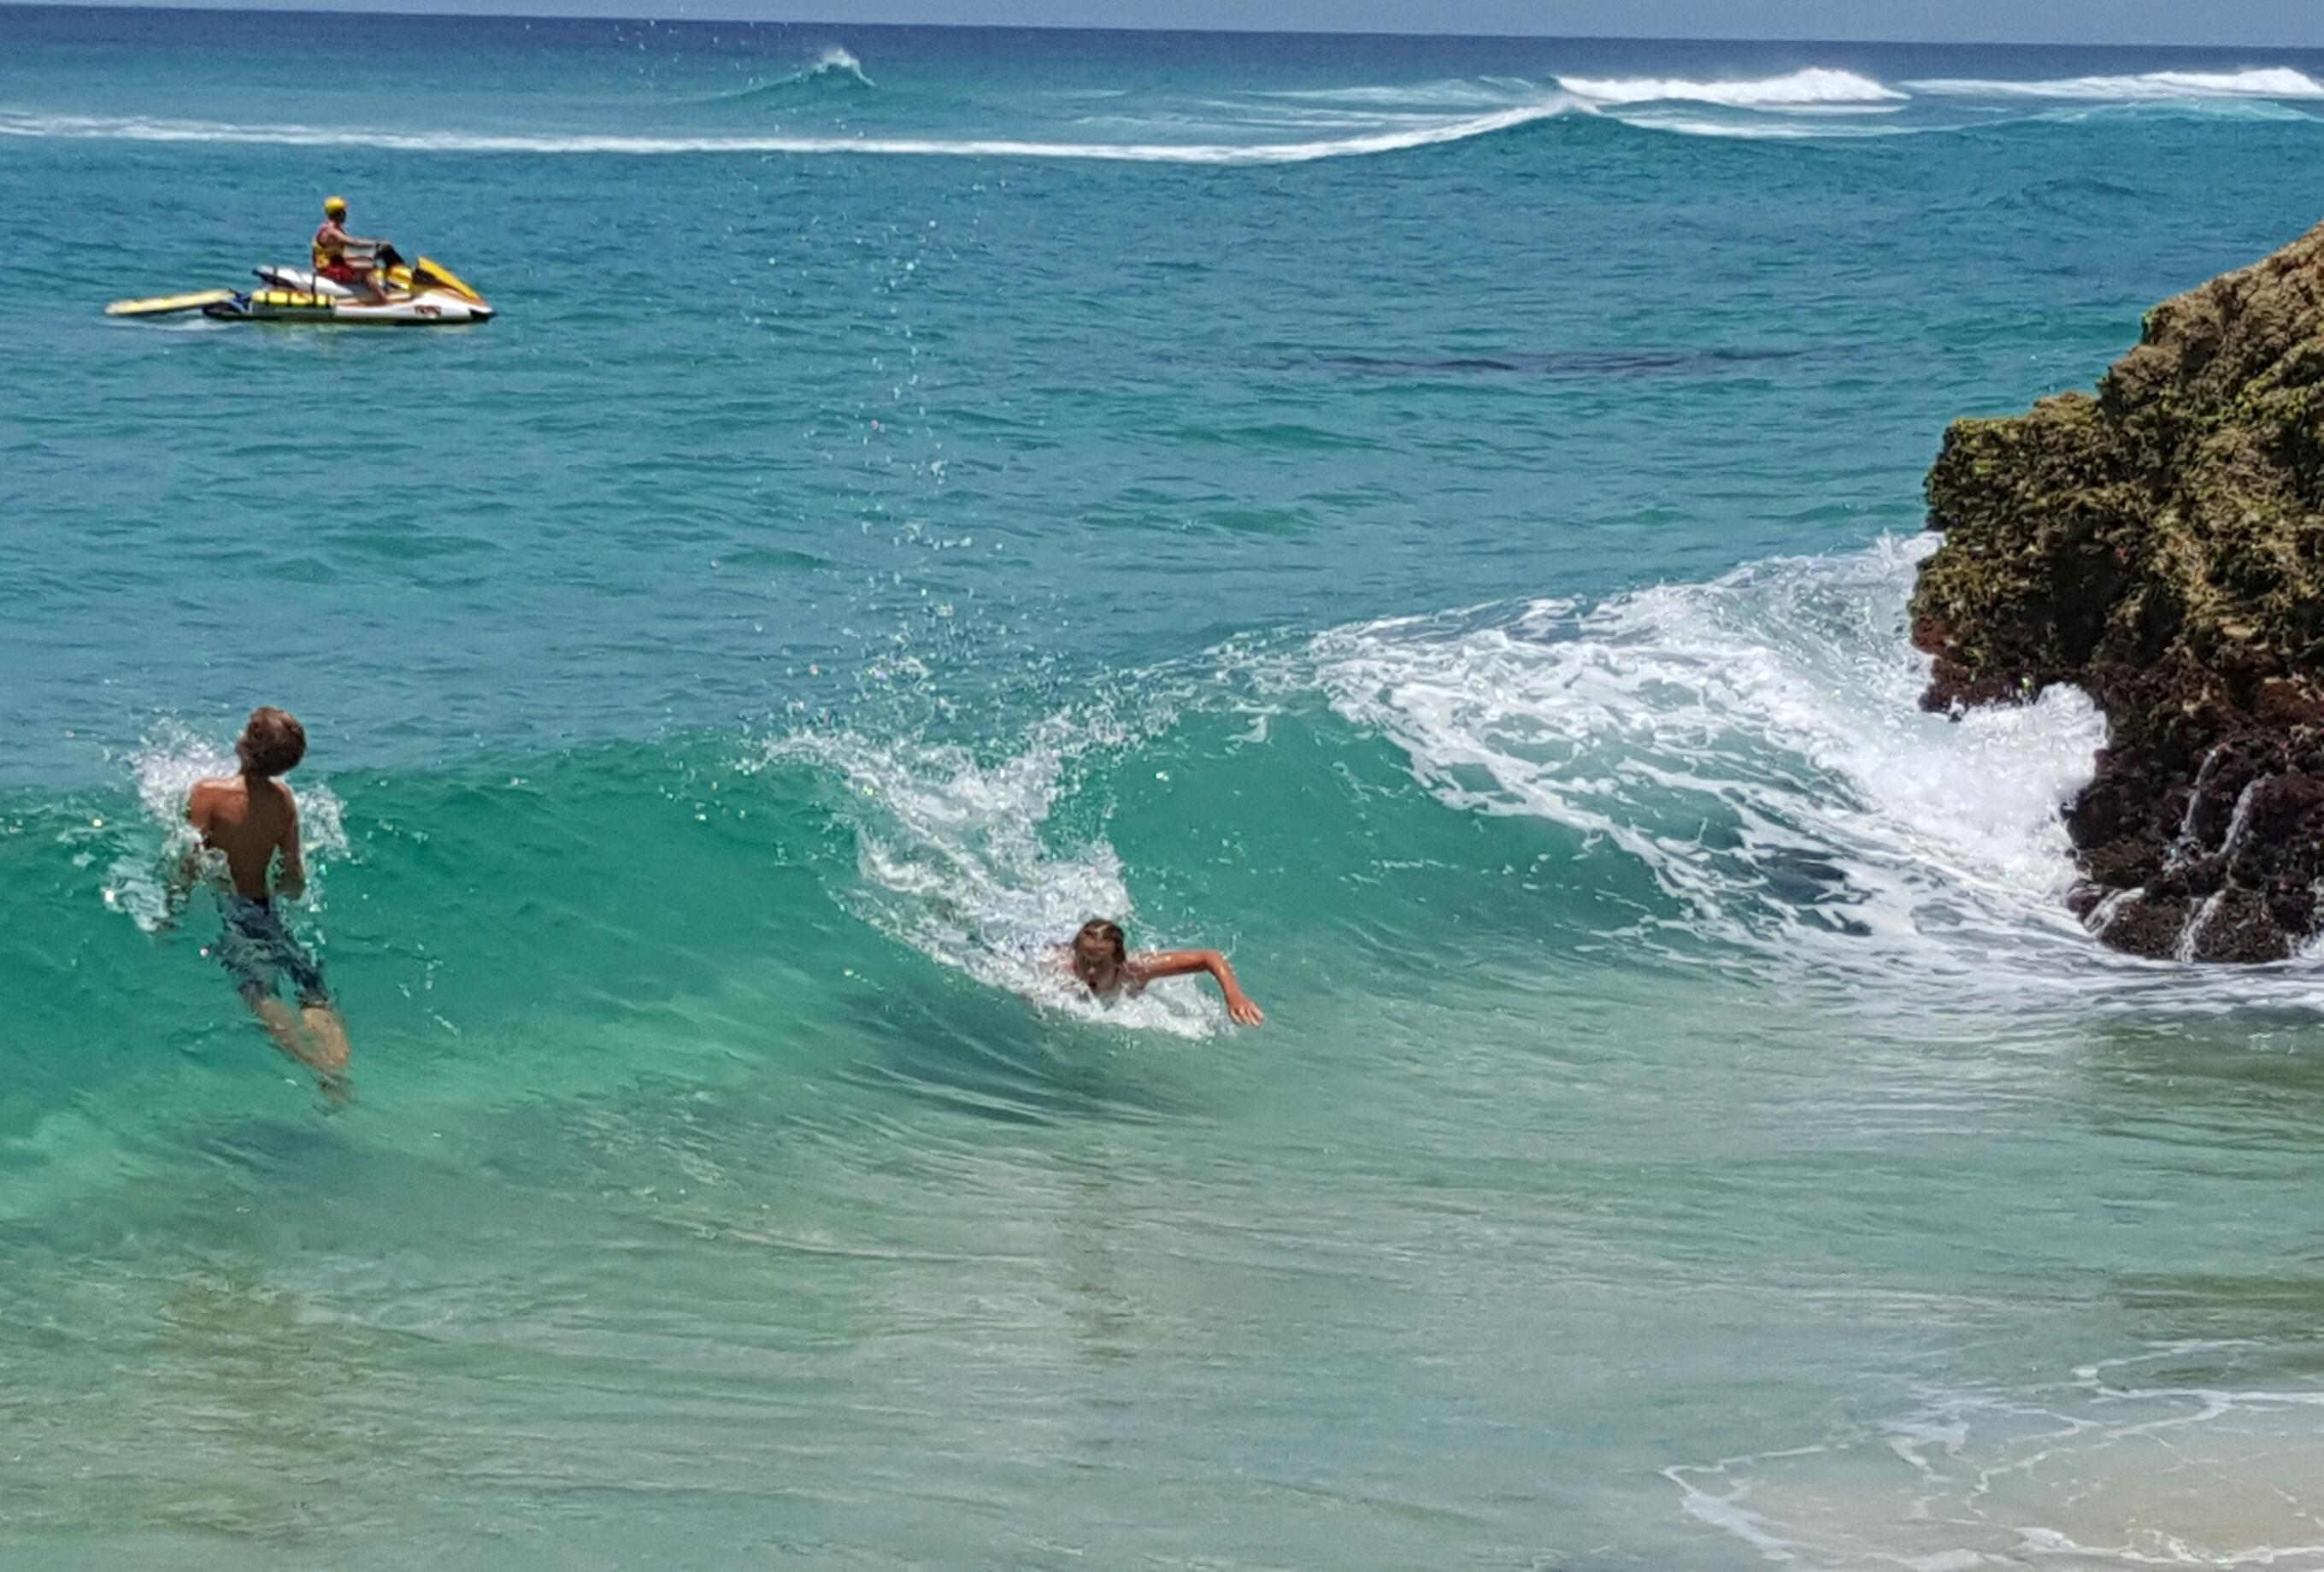 Fun in the Surf at Straddie by Annette Kachel